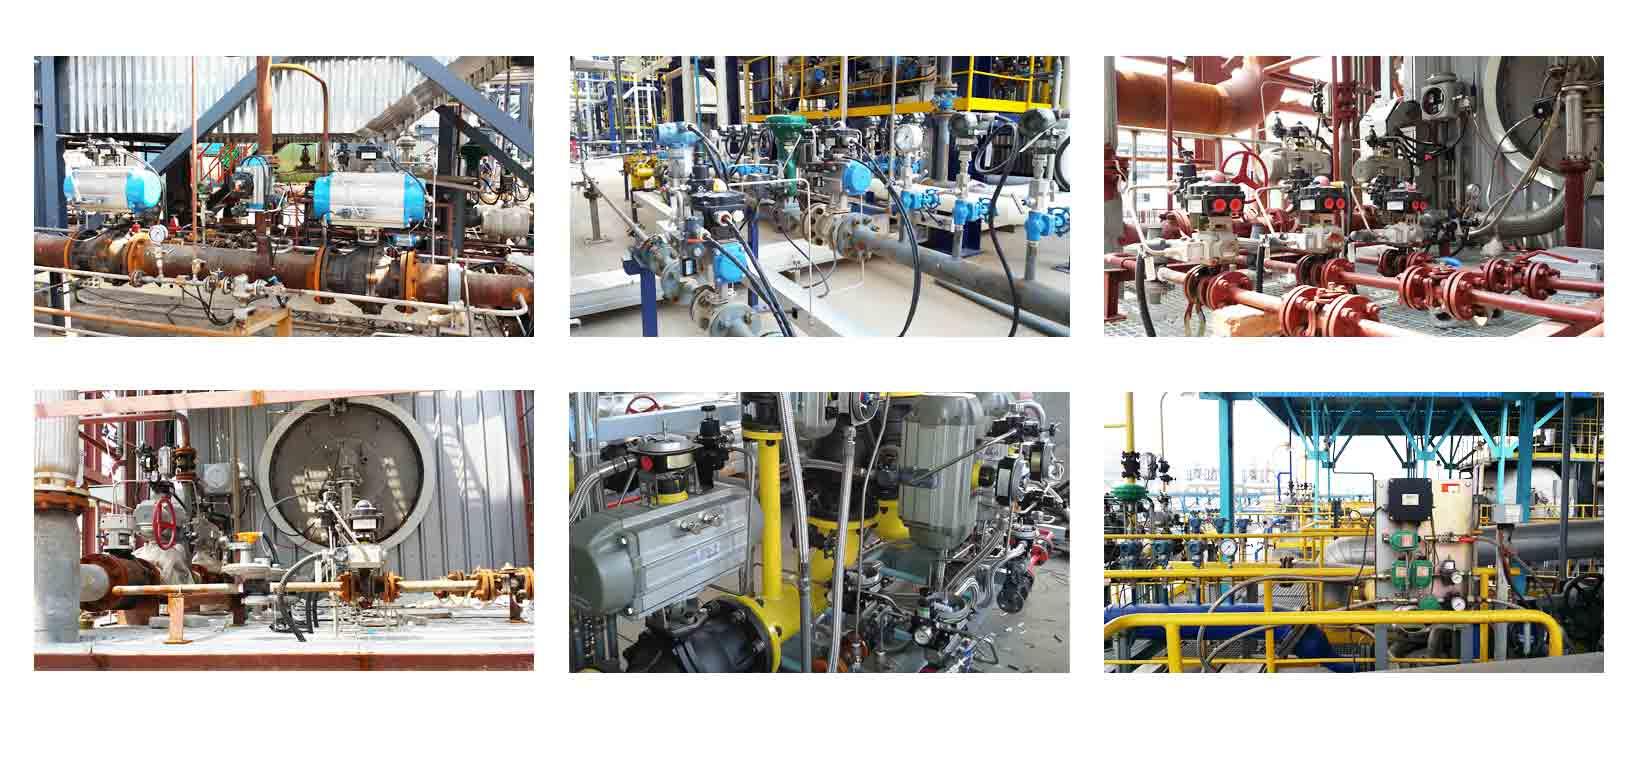 pneumatic control-valve-installation